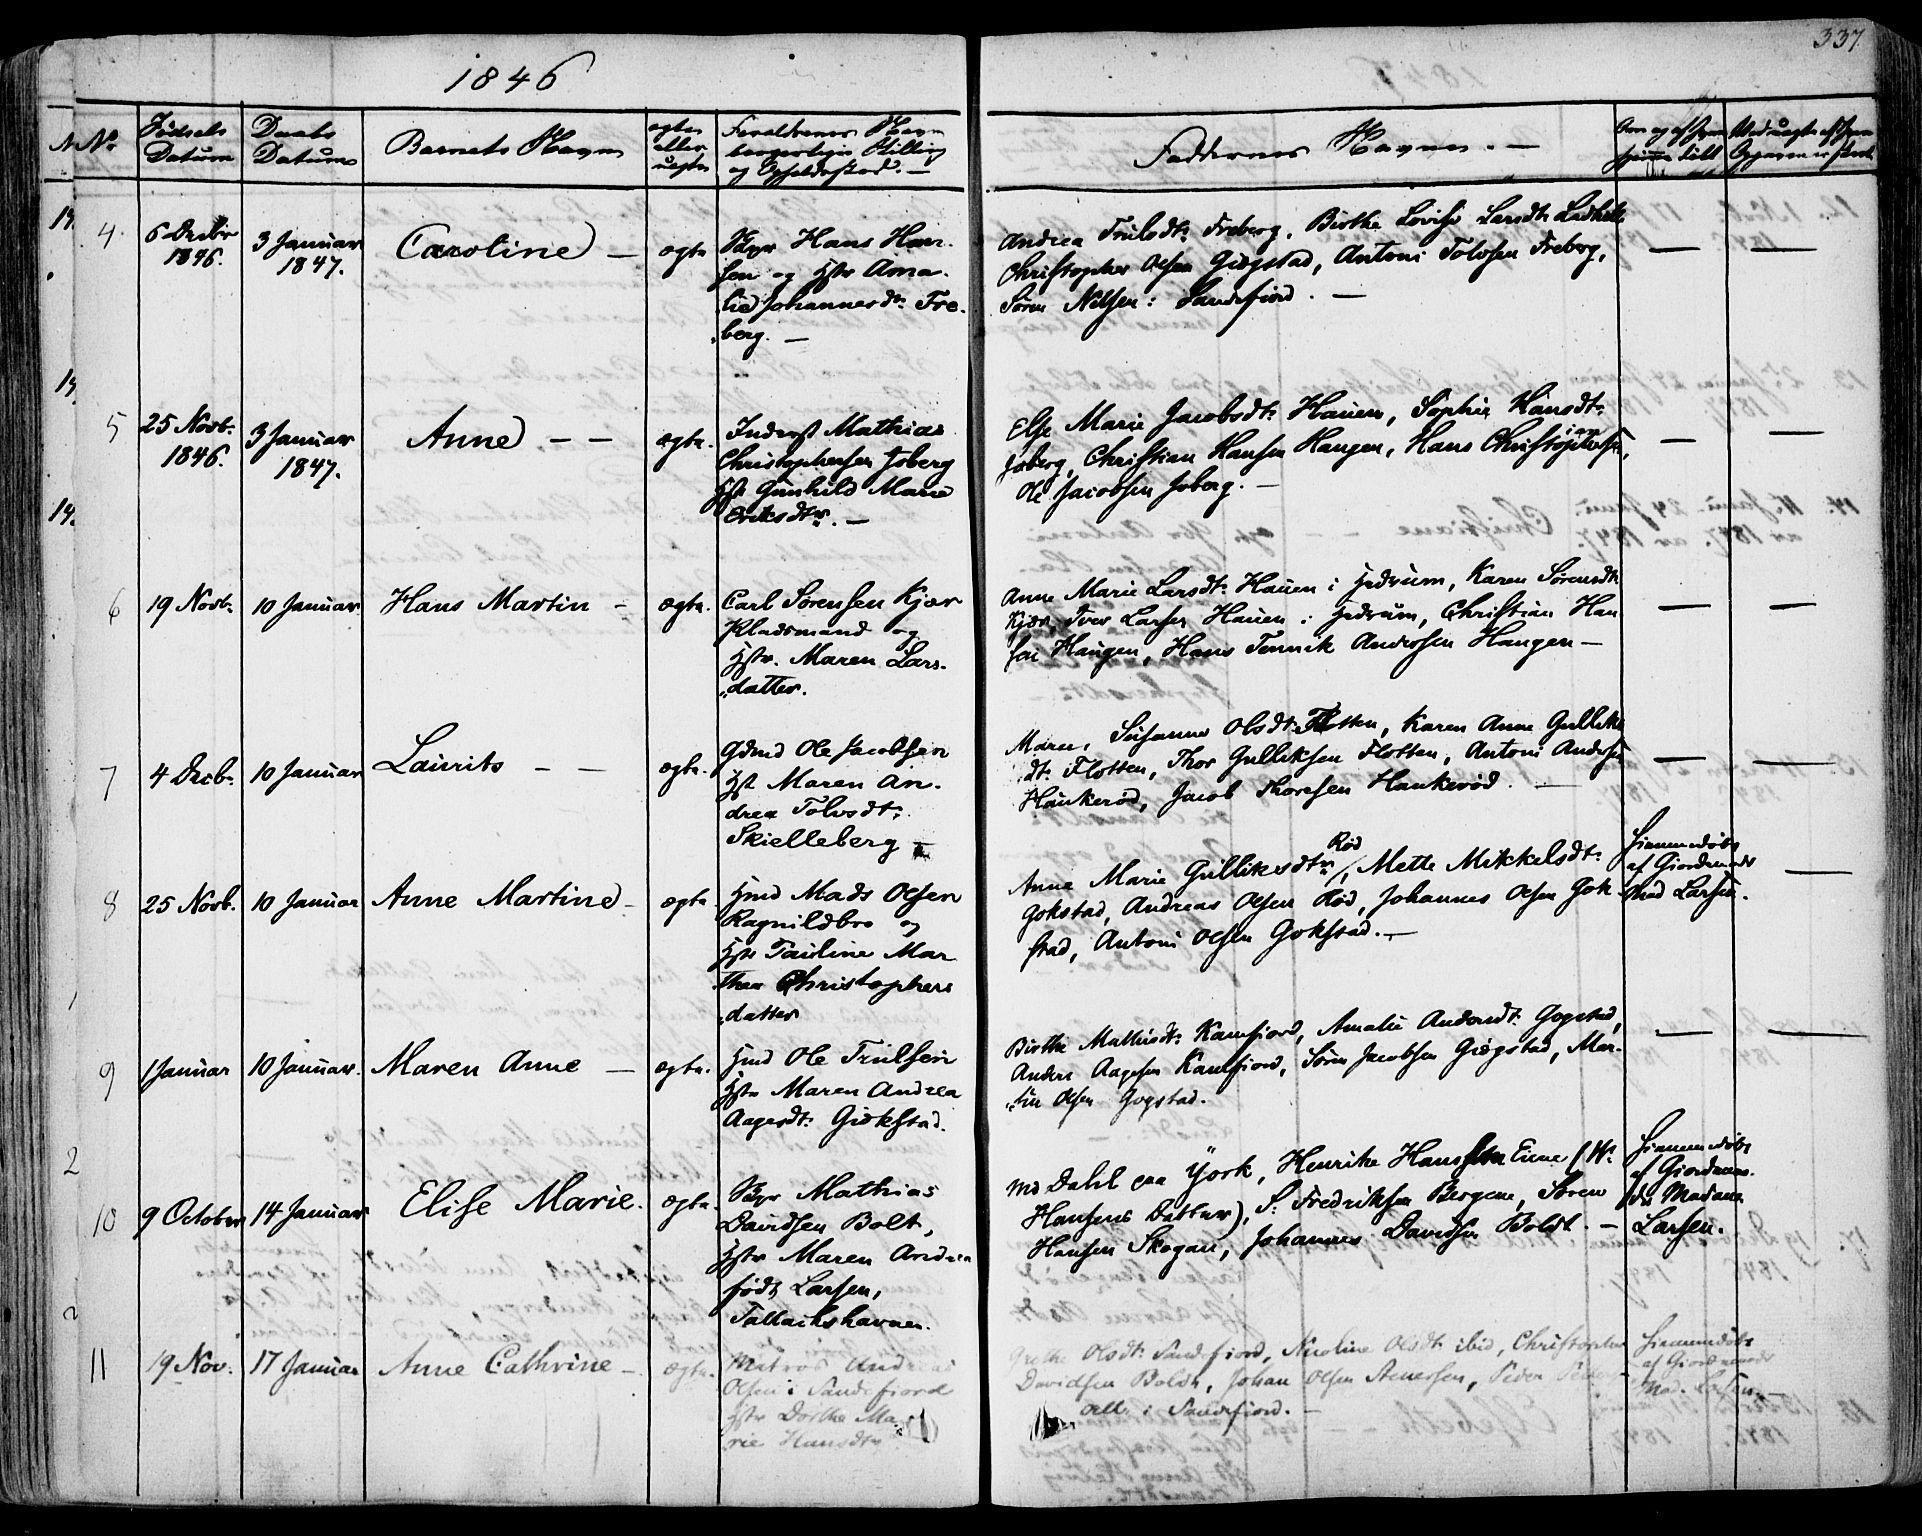 SAKO, Sandar kirkebøker, F/Fa/L0005: Parish register (official) no. 5, 1832-1847, p. 336-337